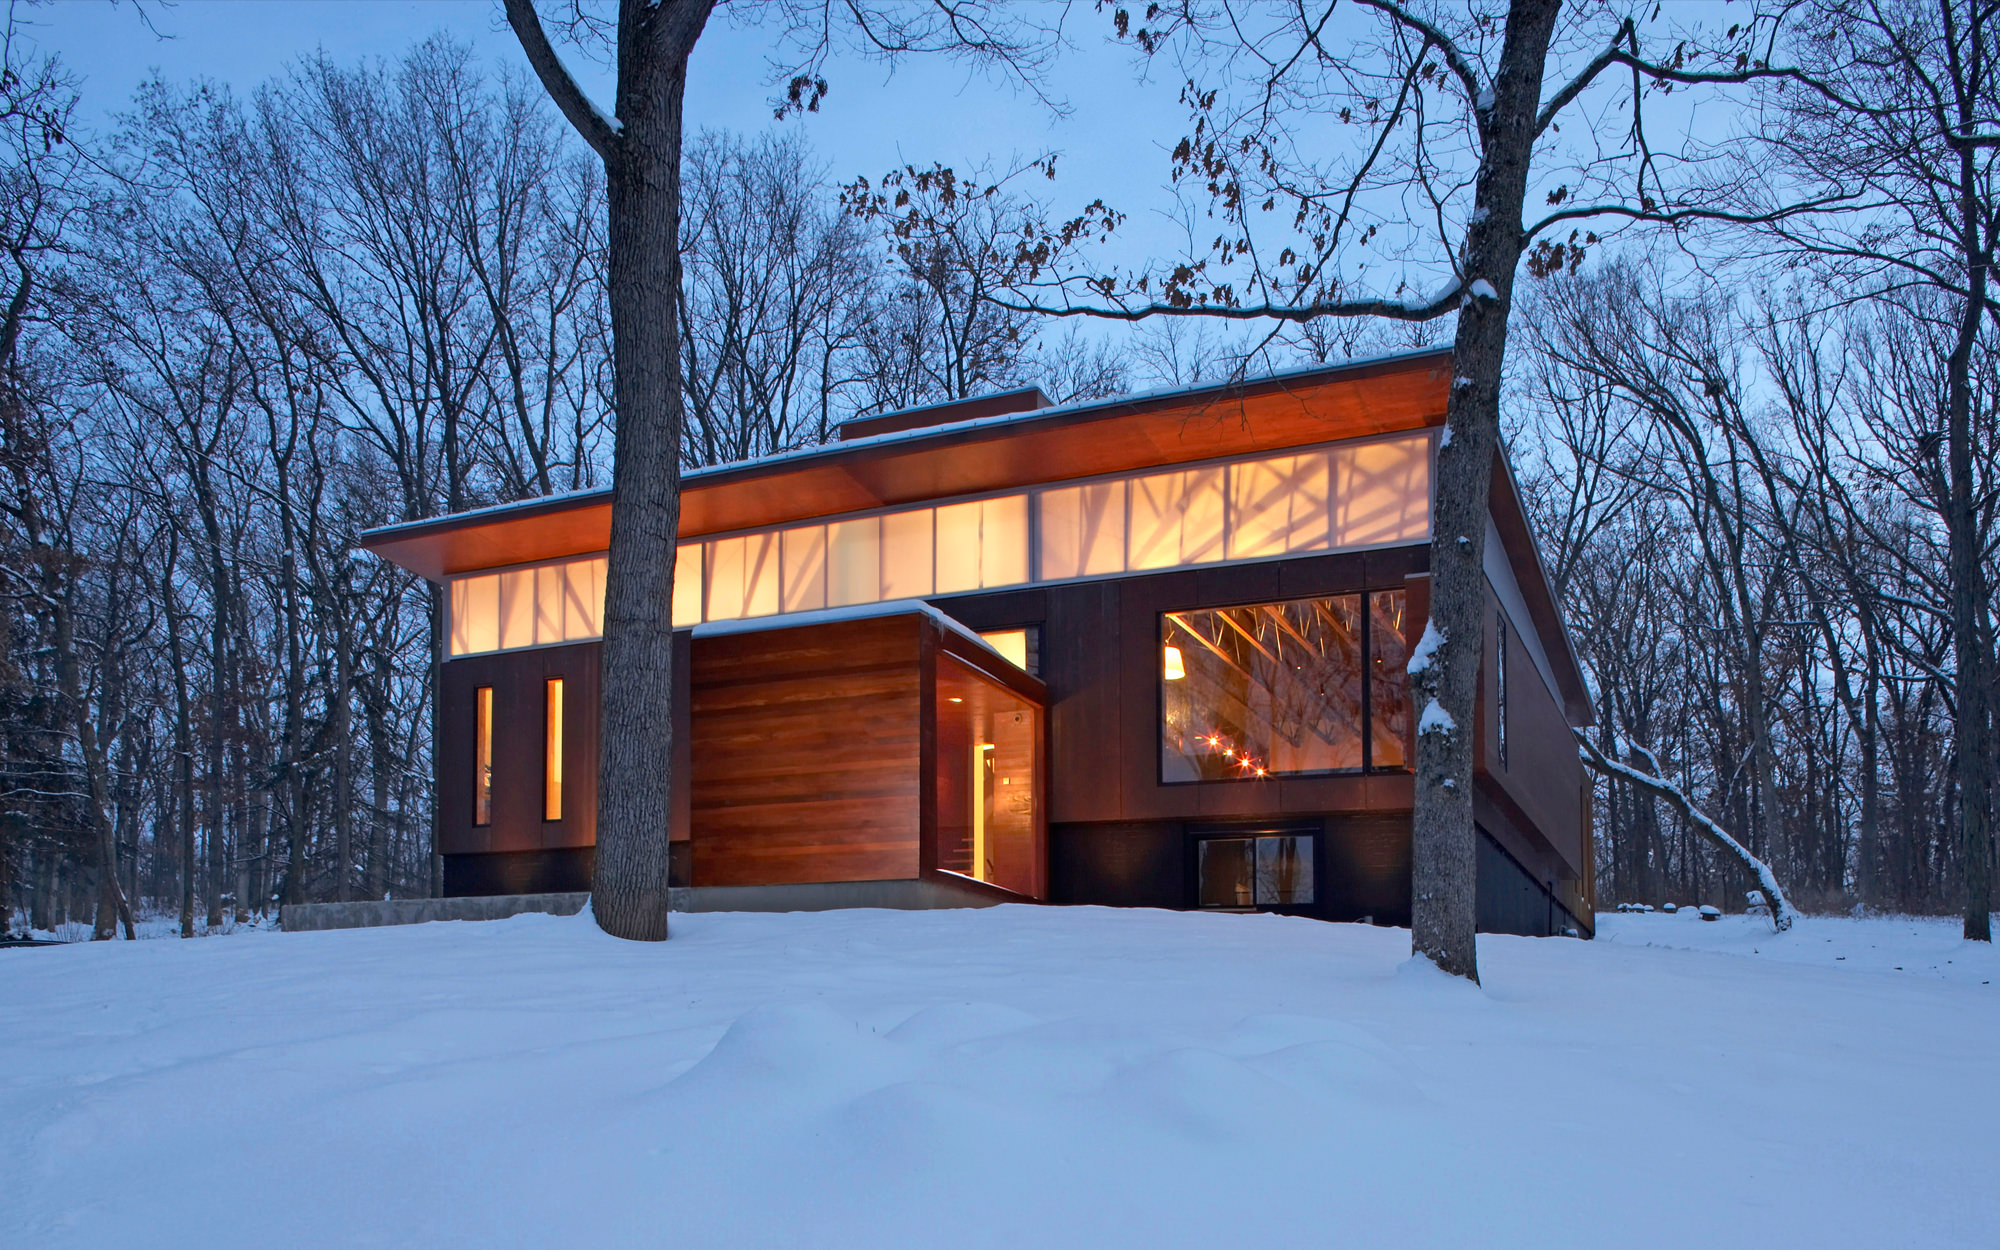 ferrous house